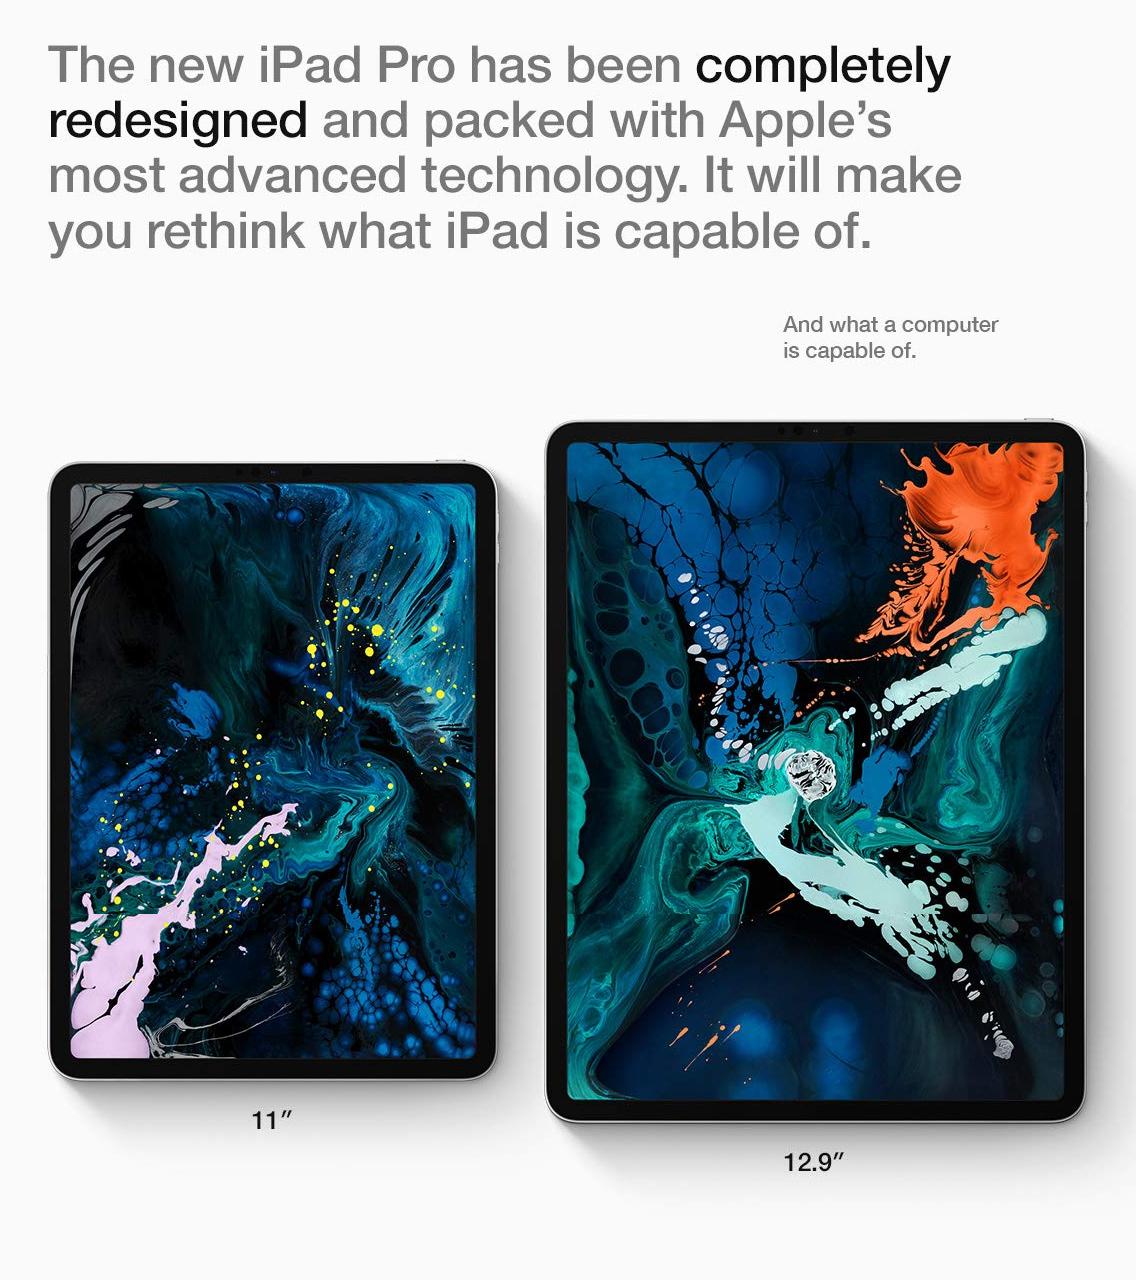 iPad Pro redesigned